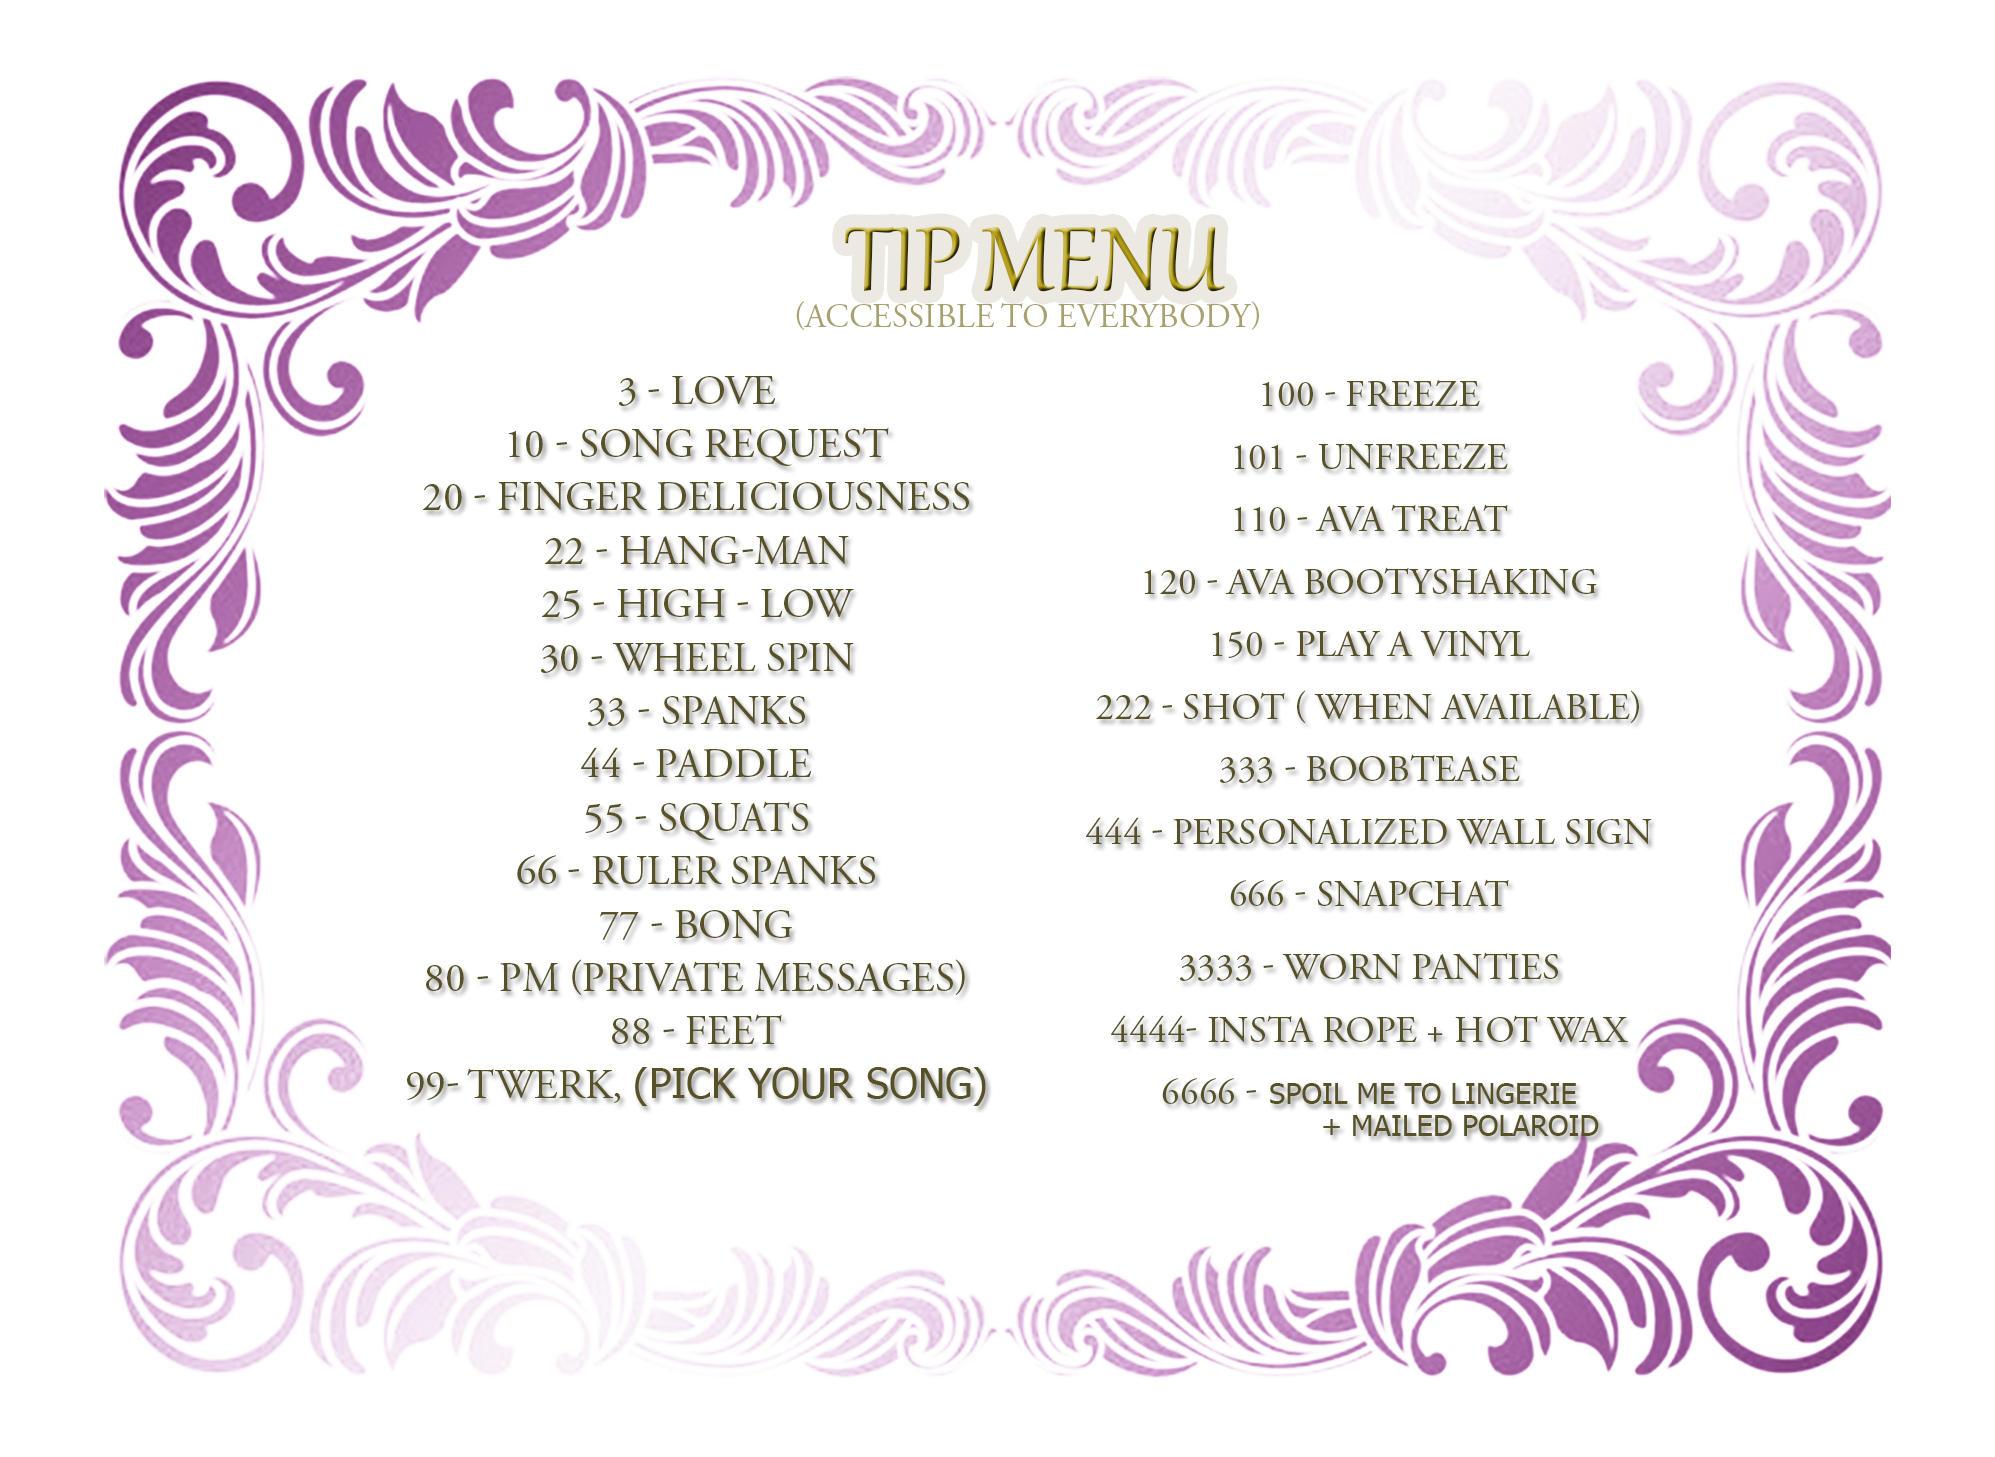 DearLilou Tip menu